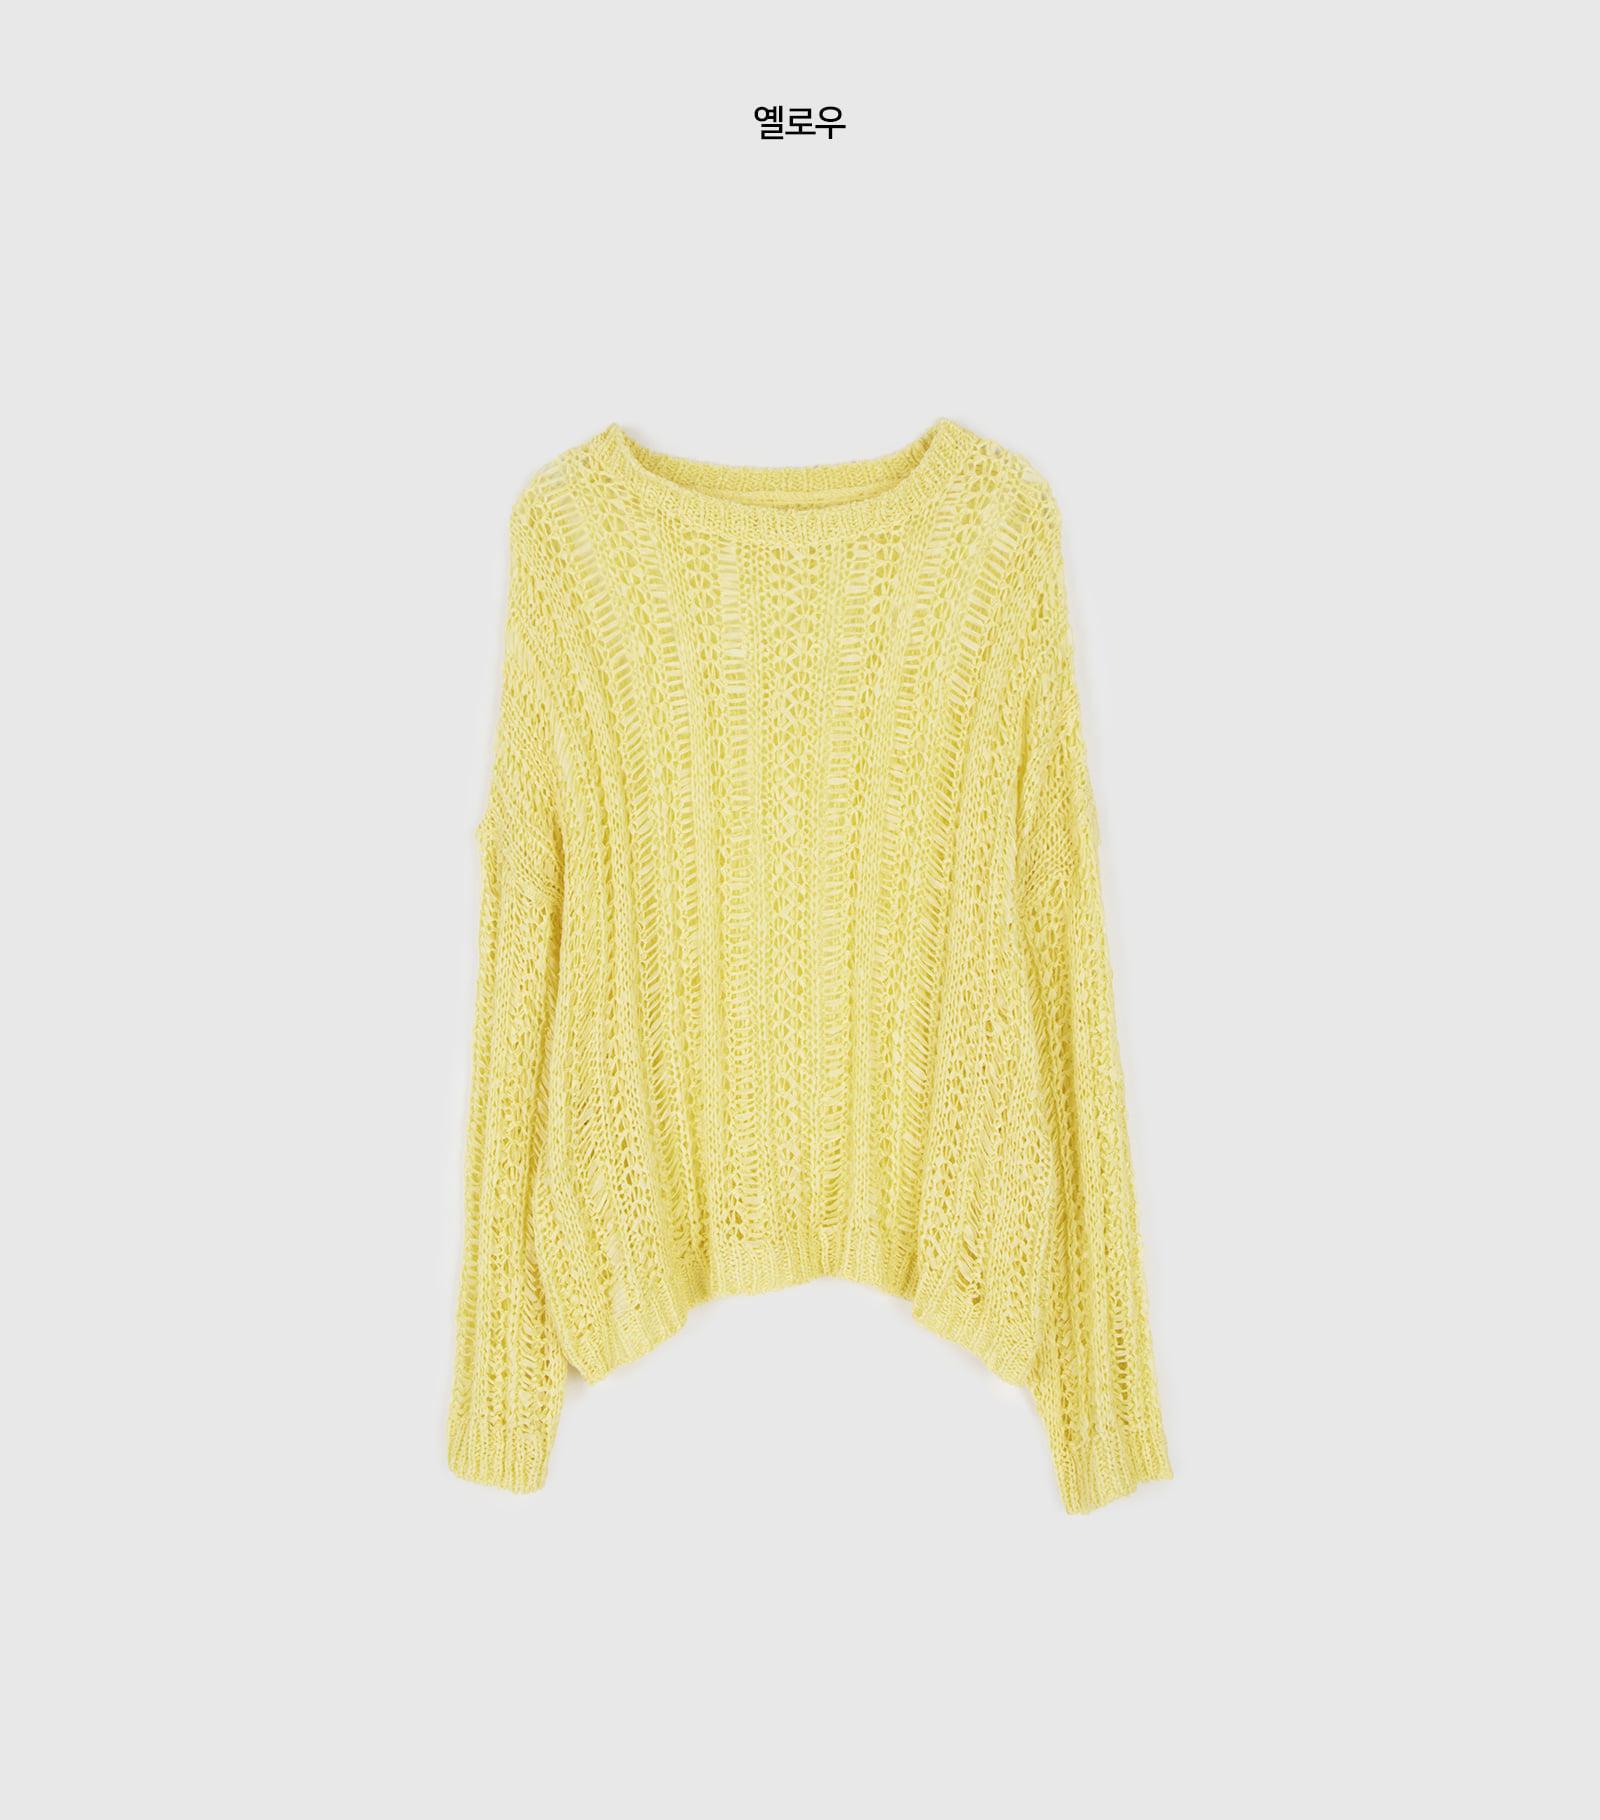 Commit net round neck knit